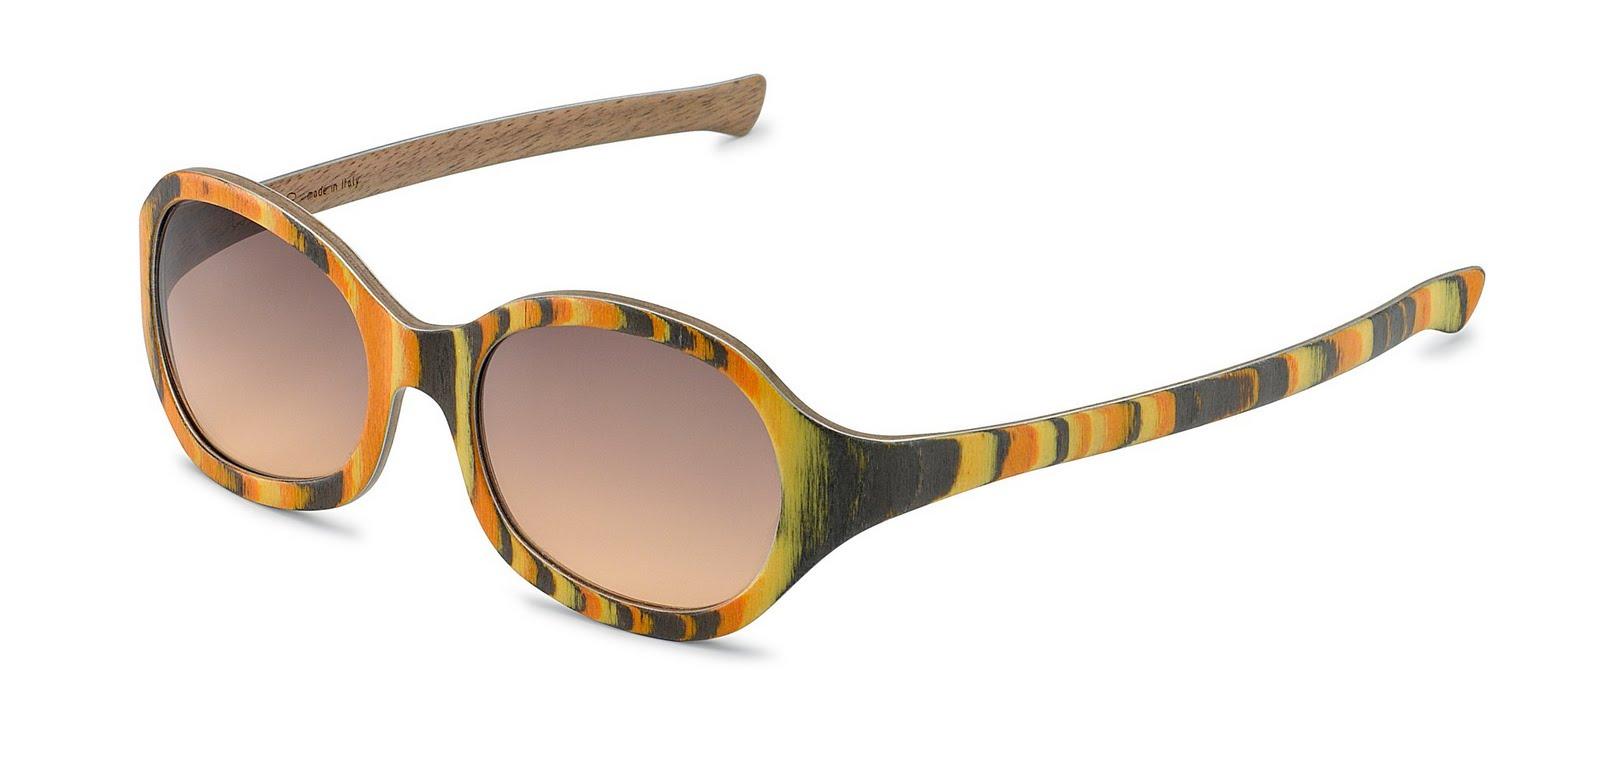 Eyeglass Frames In The Mail : designer eyewear